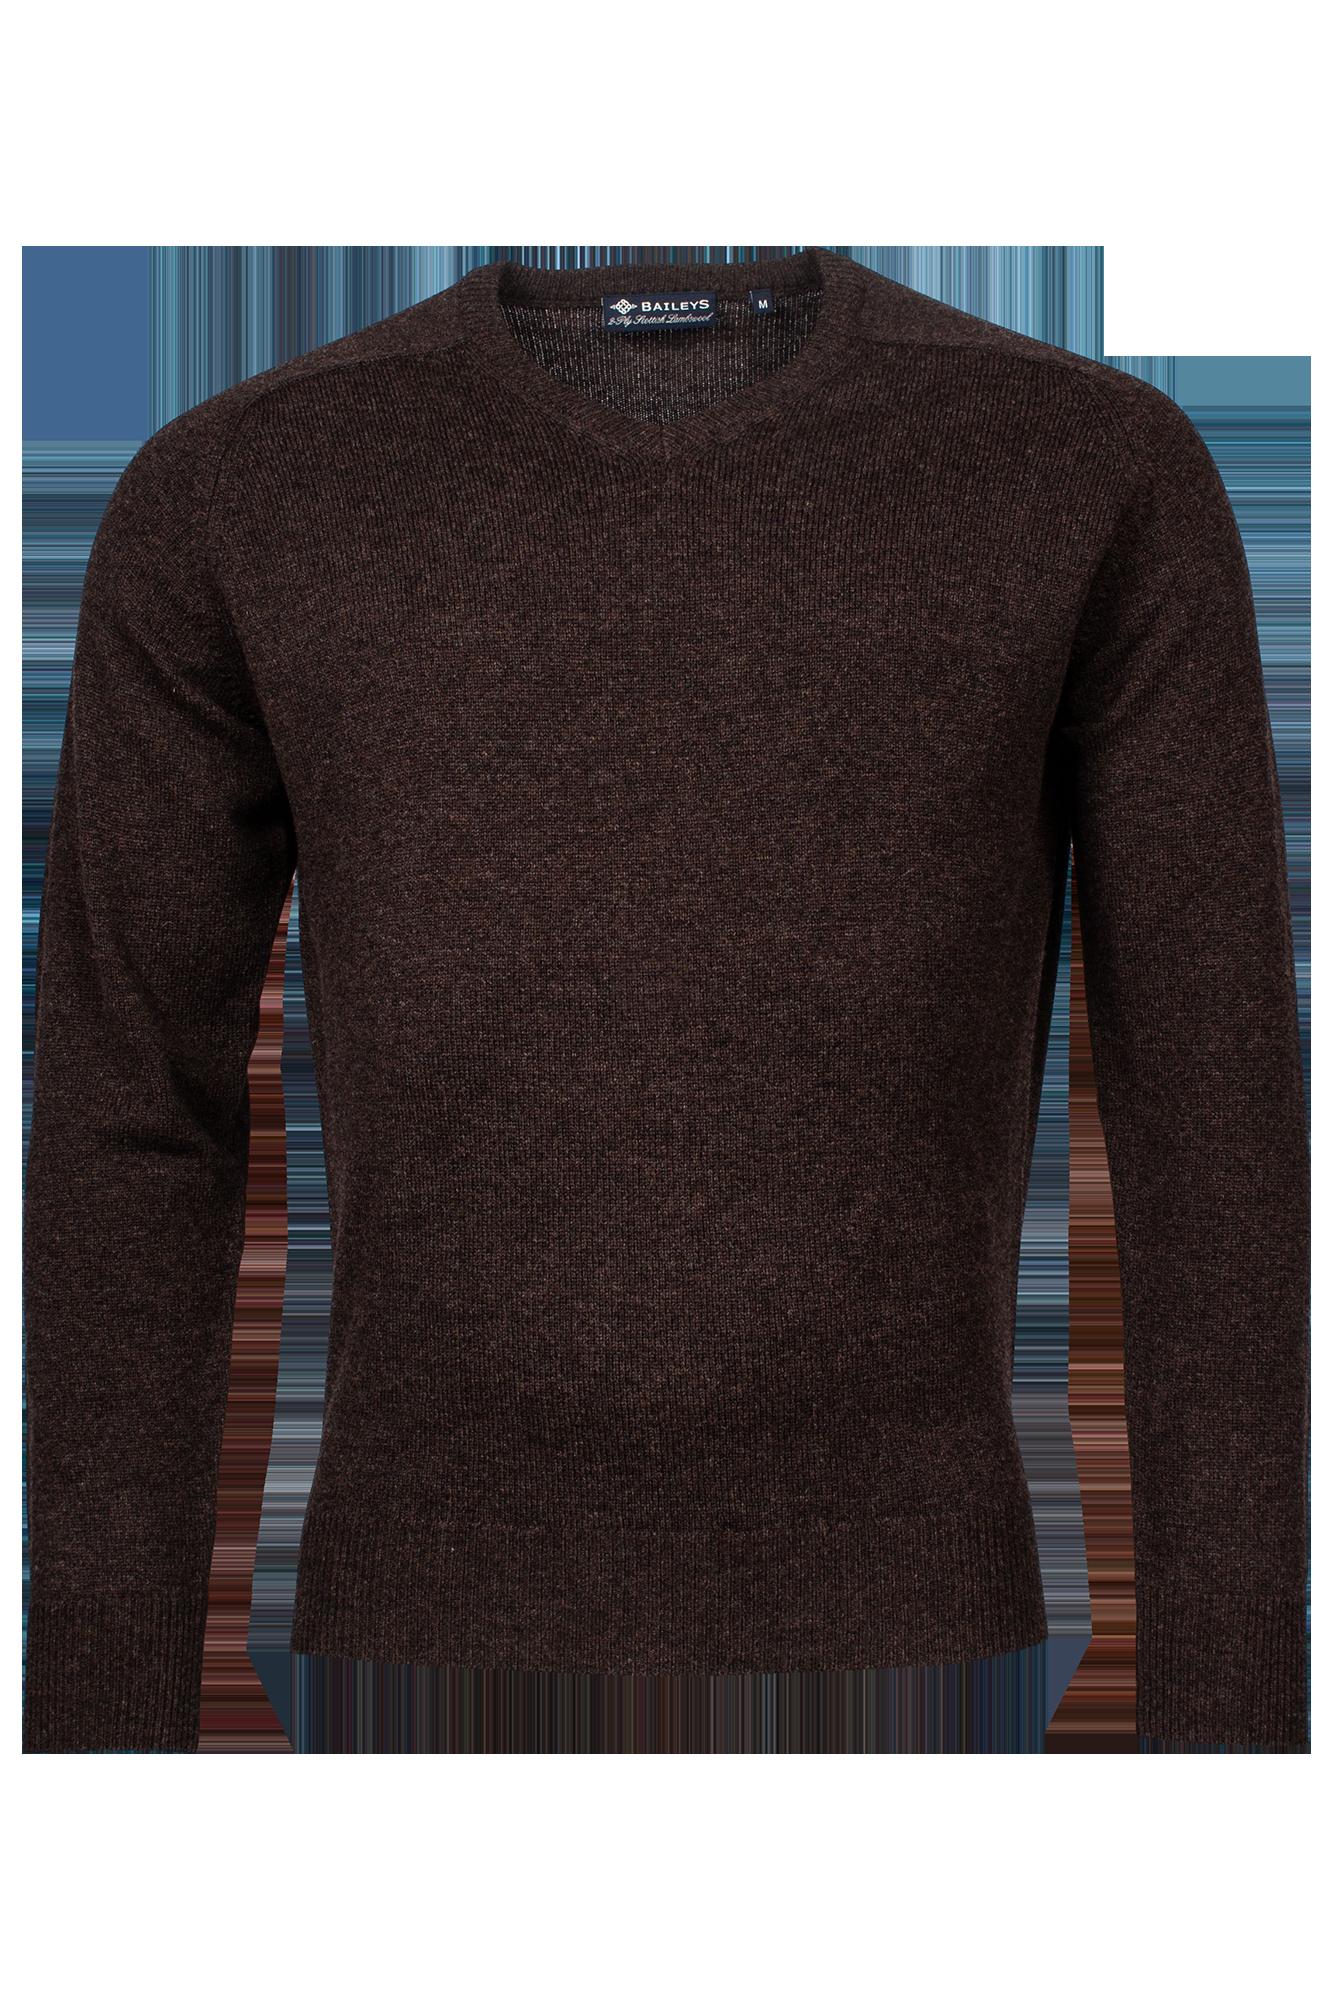 Baileys lamswollen pullover, v-hals, donkerbruin